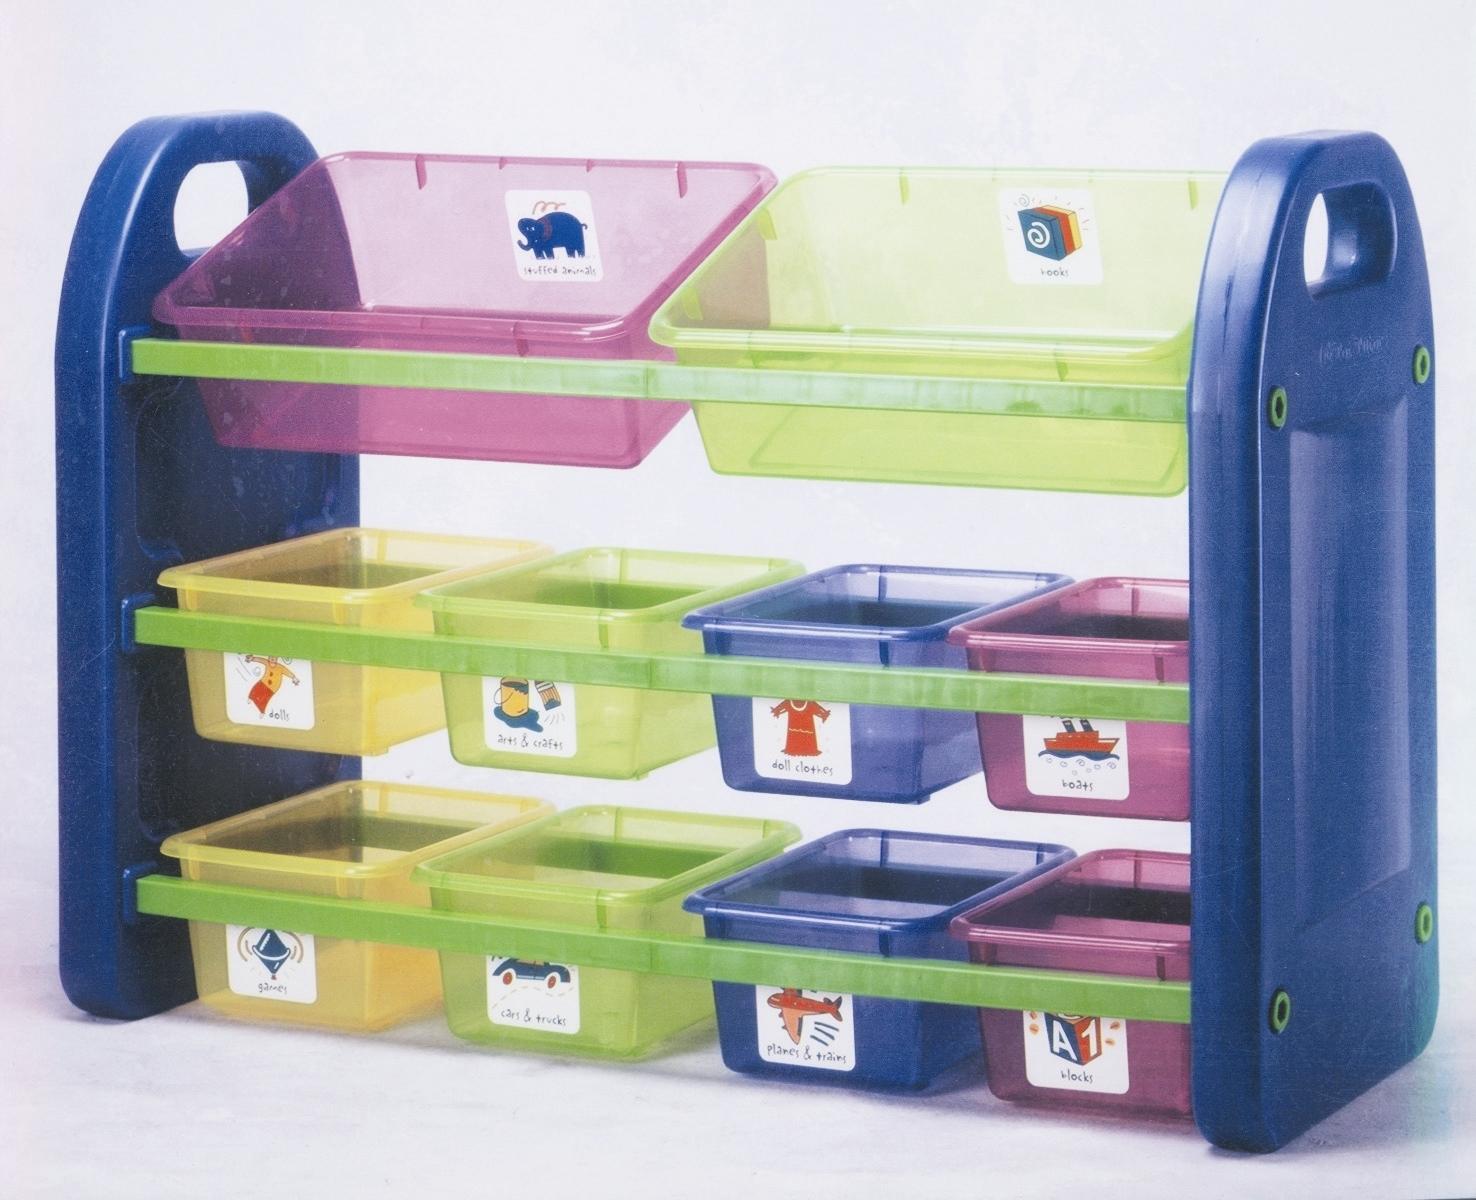 10Bin 3 Tier Storage Organizer - Brand New in Cartons